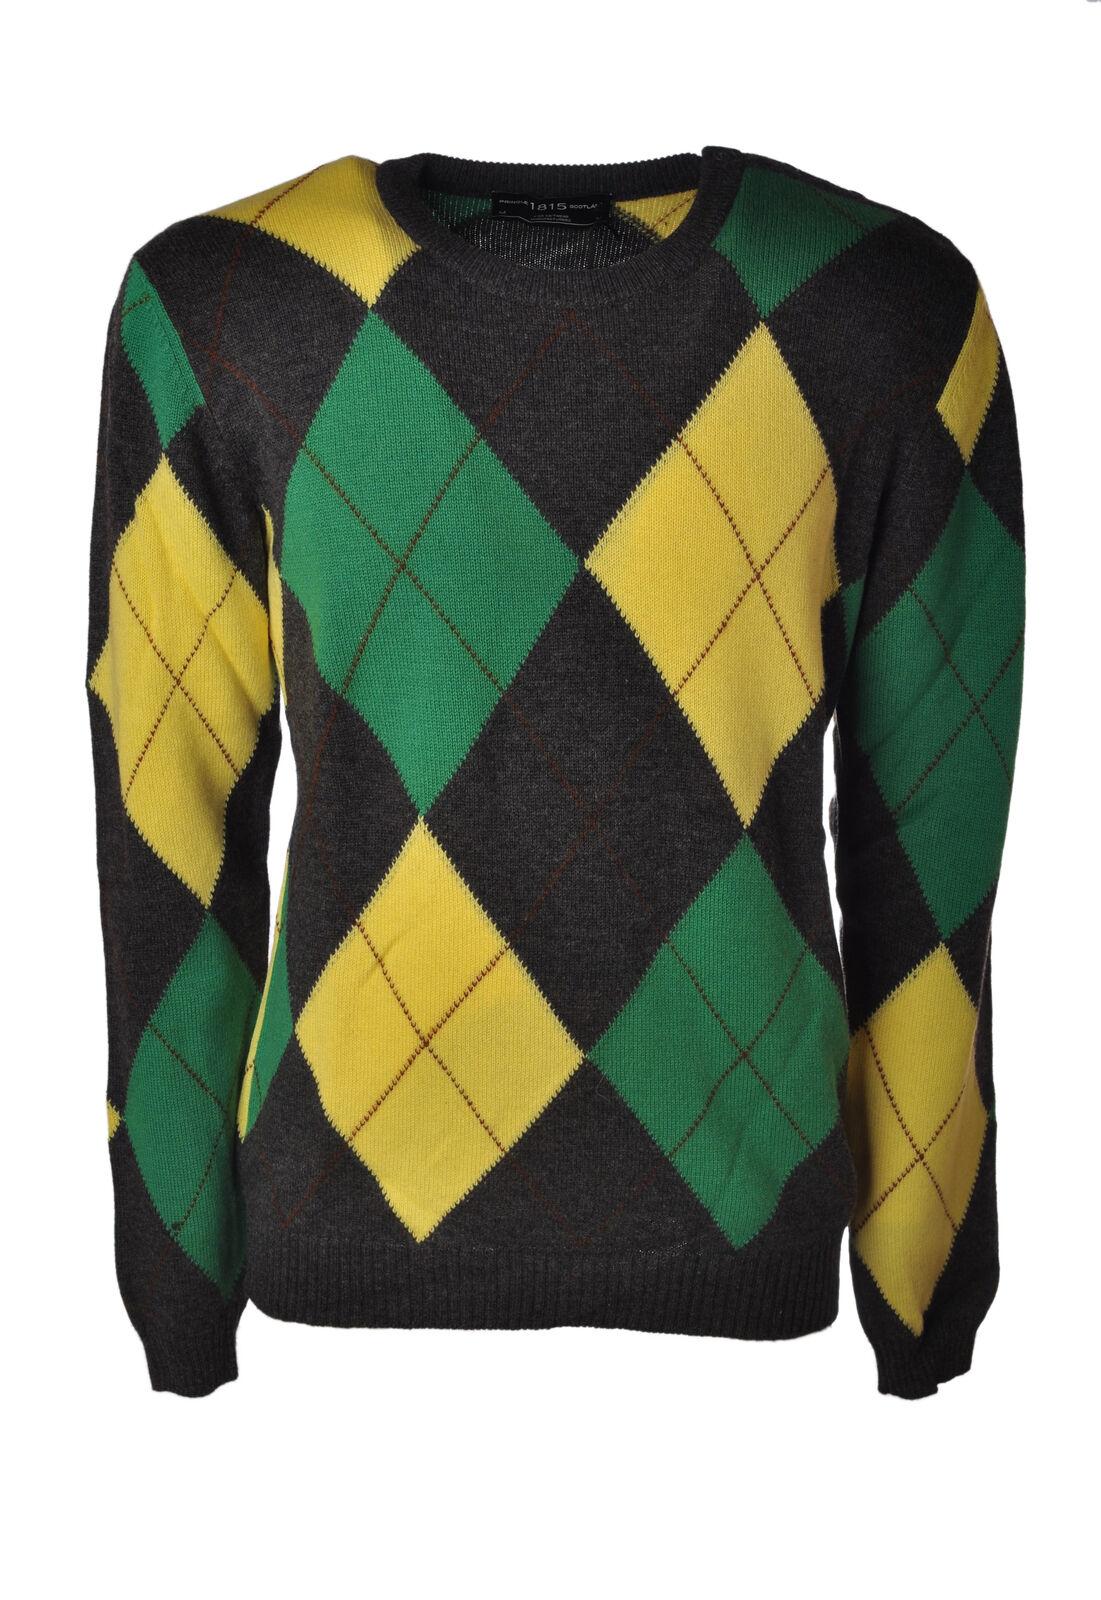 Pringle  -  Sweaters - Male - Fantasy - 4661821A182035